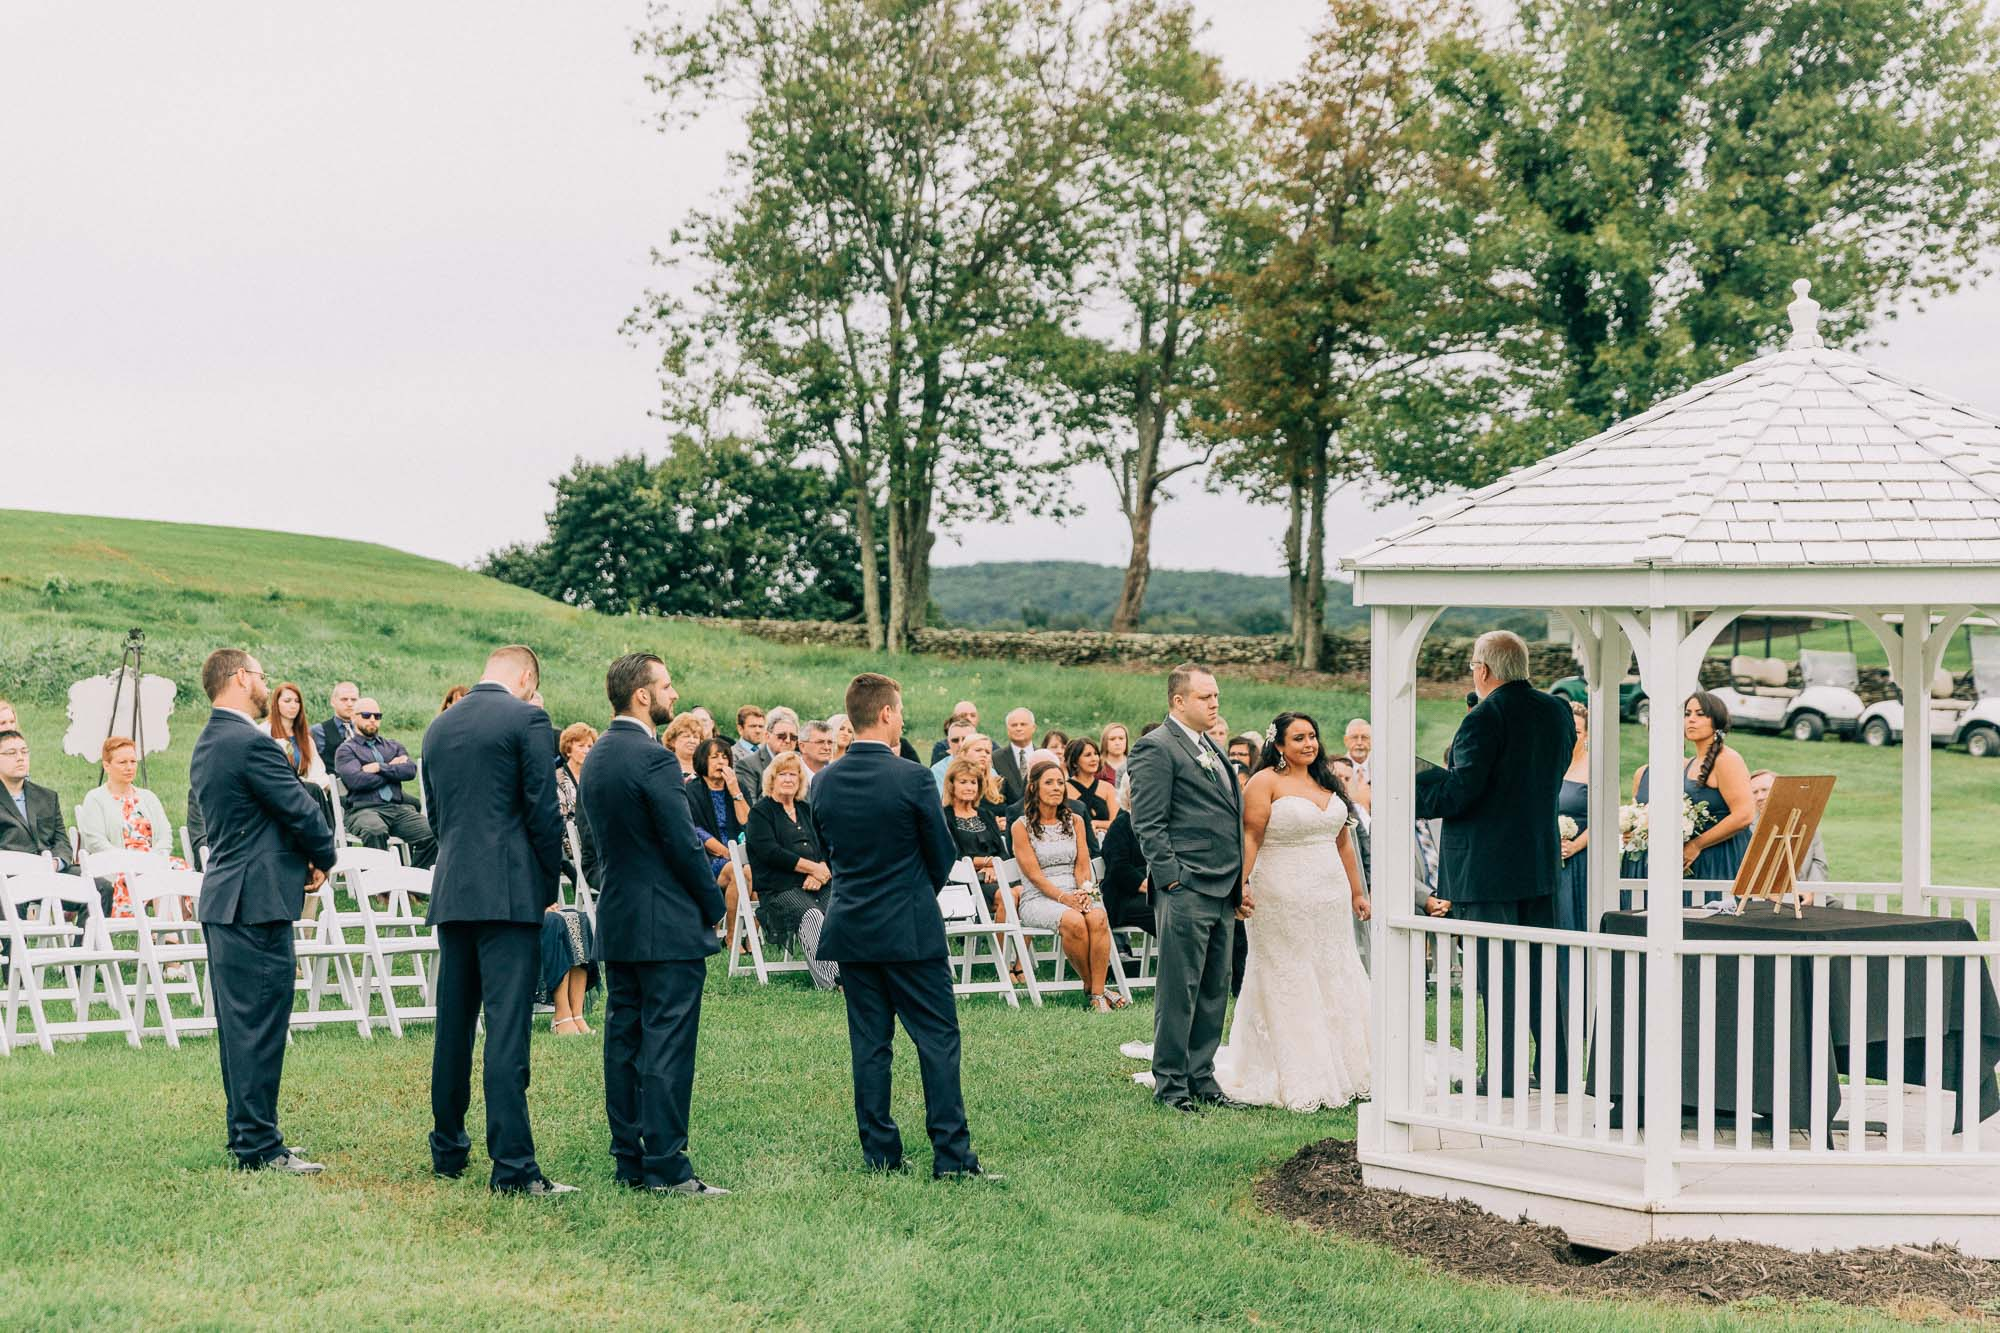 stonhedge-country-club-wedding-3059.jpg